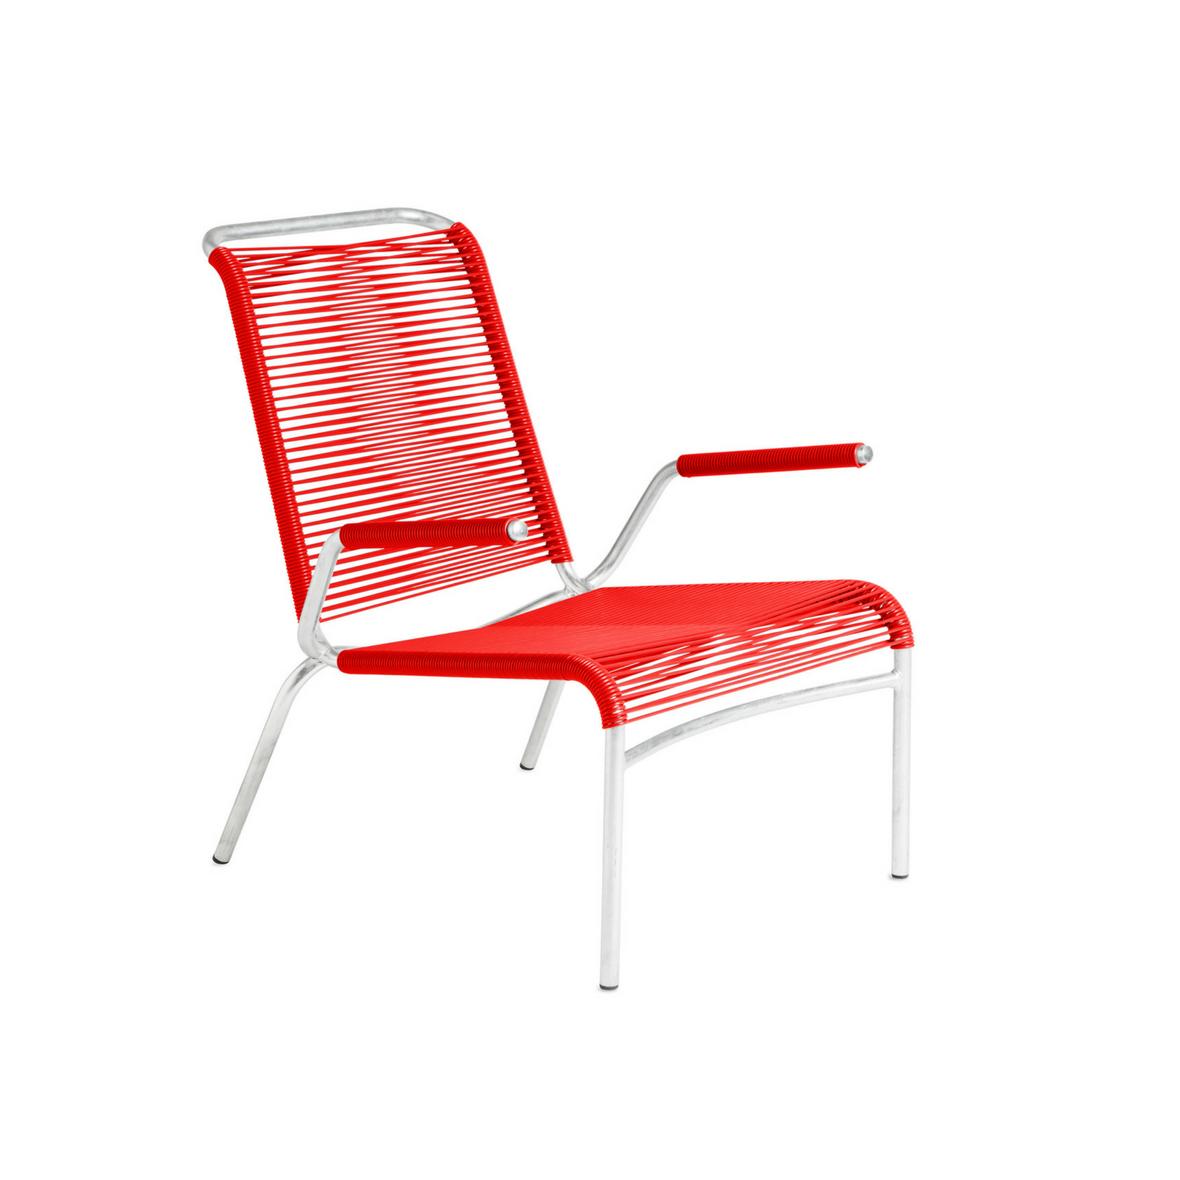 Altorfer Lounge Sessel 1142 Verkehrsrot von Embru